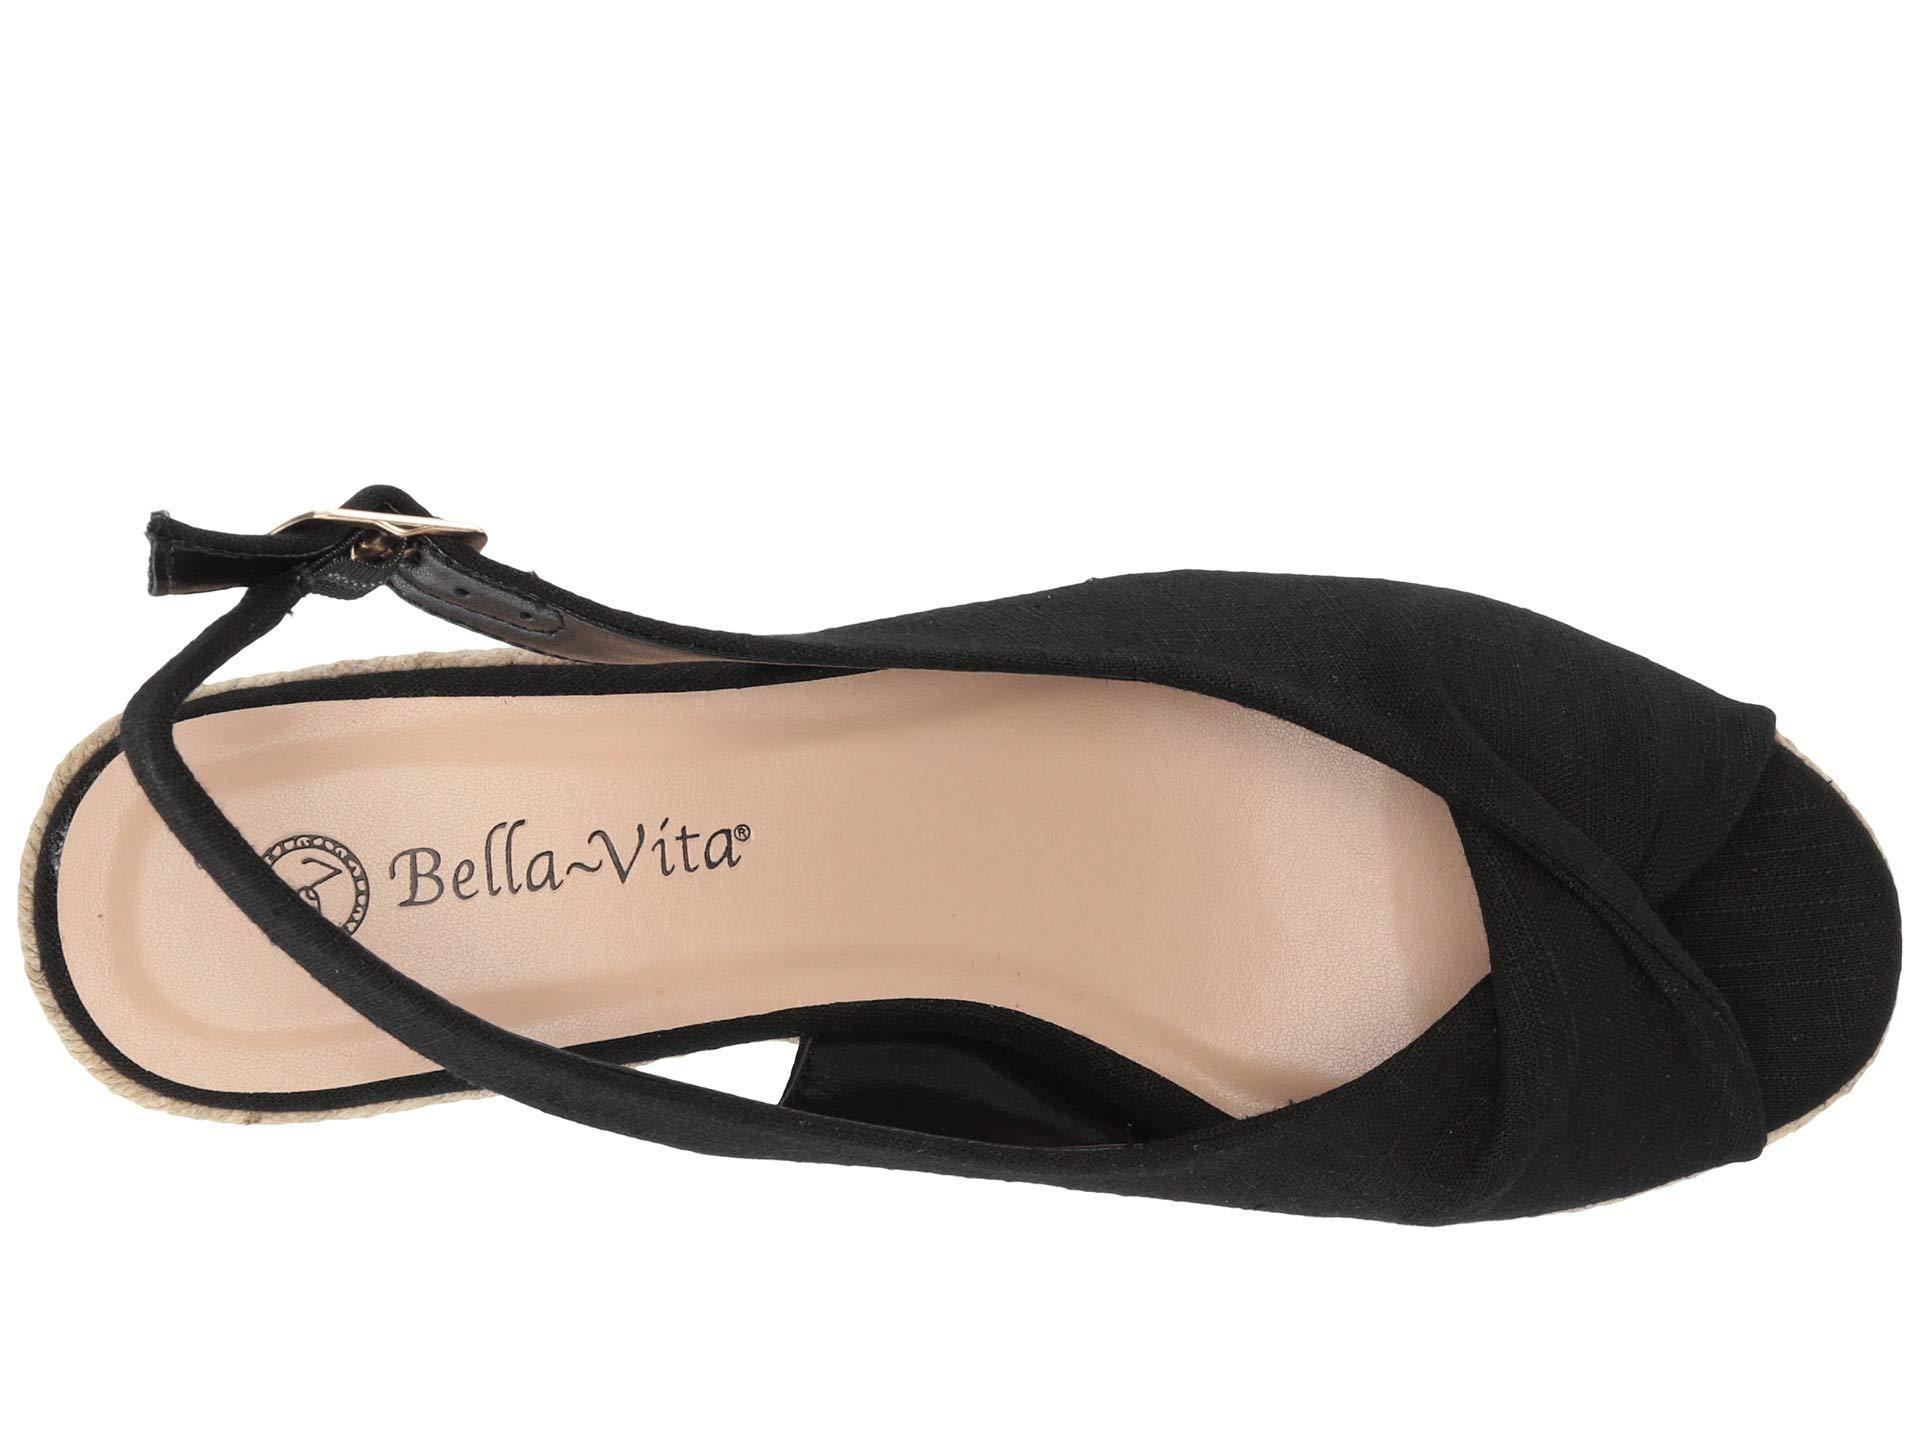 426a539ea01 Bella Vita - Black Sylvie Ii (soft Denim) Women s Shoes - Lyst. View  fullscreen